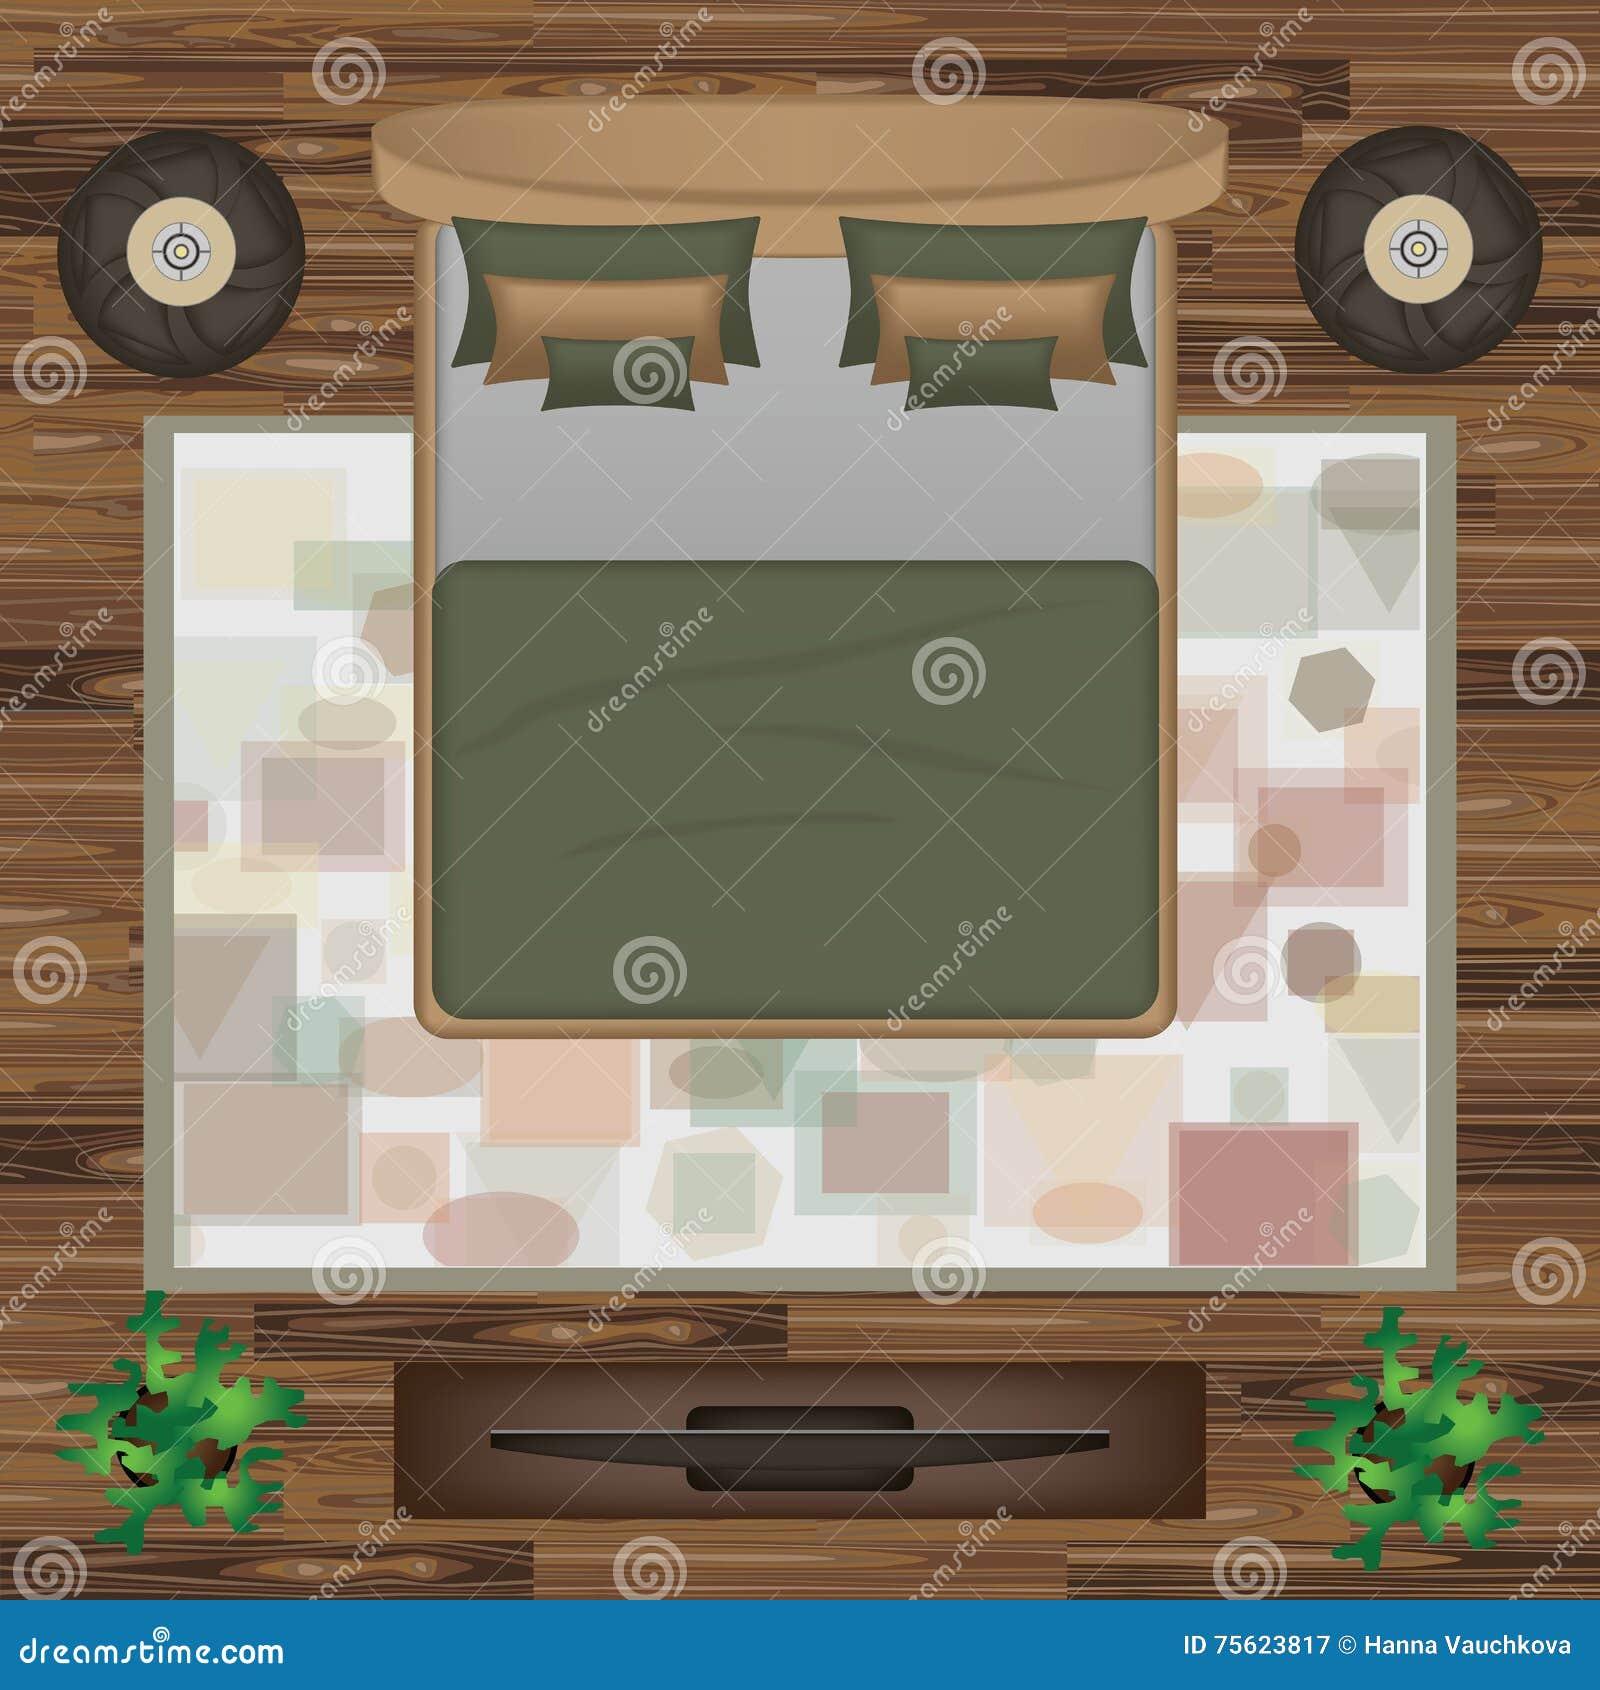 Beau Download Bed, Pillows, Carpet, Pouf, Plants Vector Illustration. Bedroom  Furniture Set